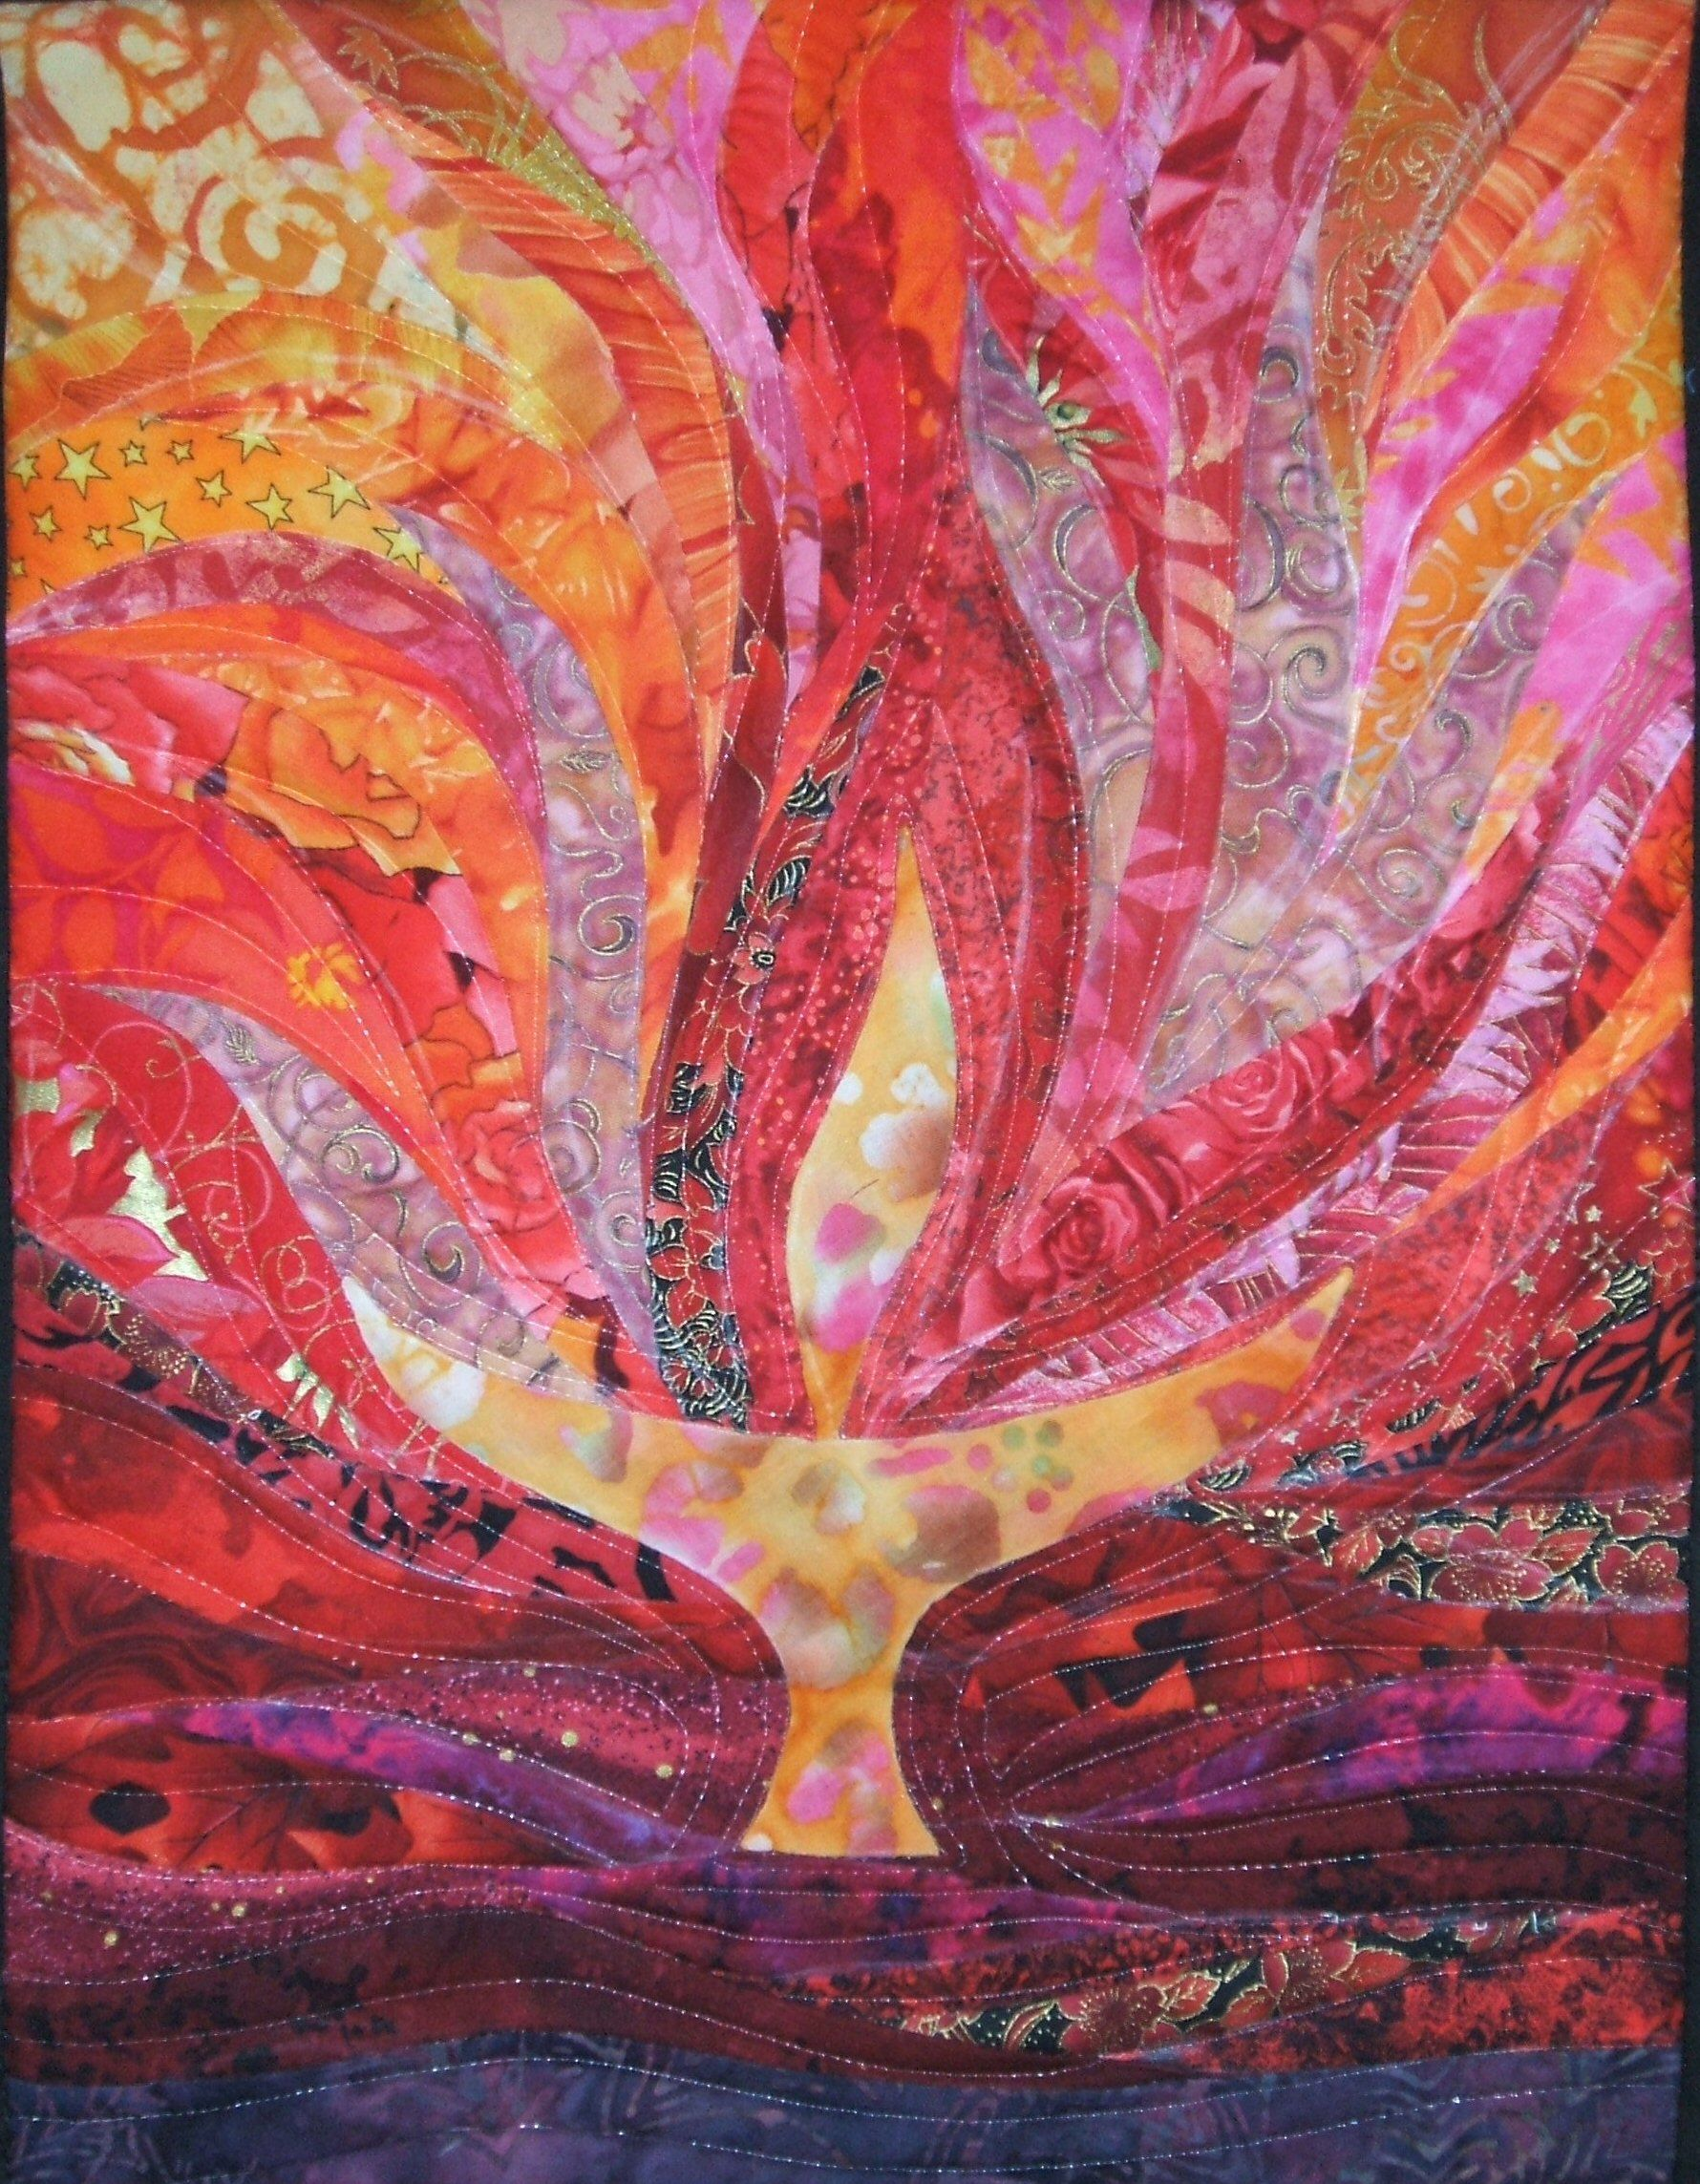 acryllic paint on canvas uu chalice print ; purple green yellow mardi gras colors poster prints or original unitarian universalist art